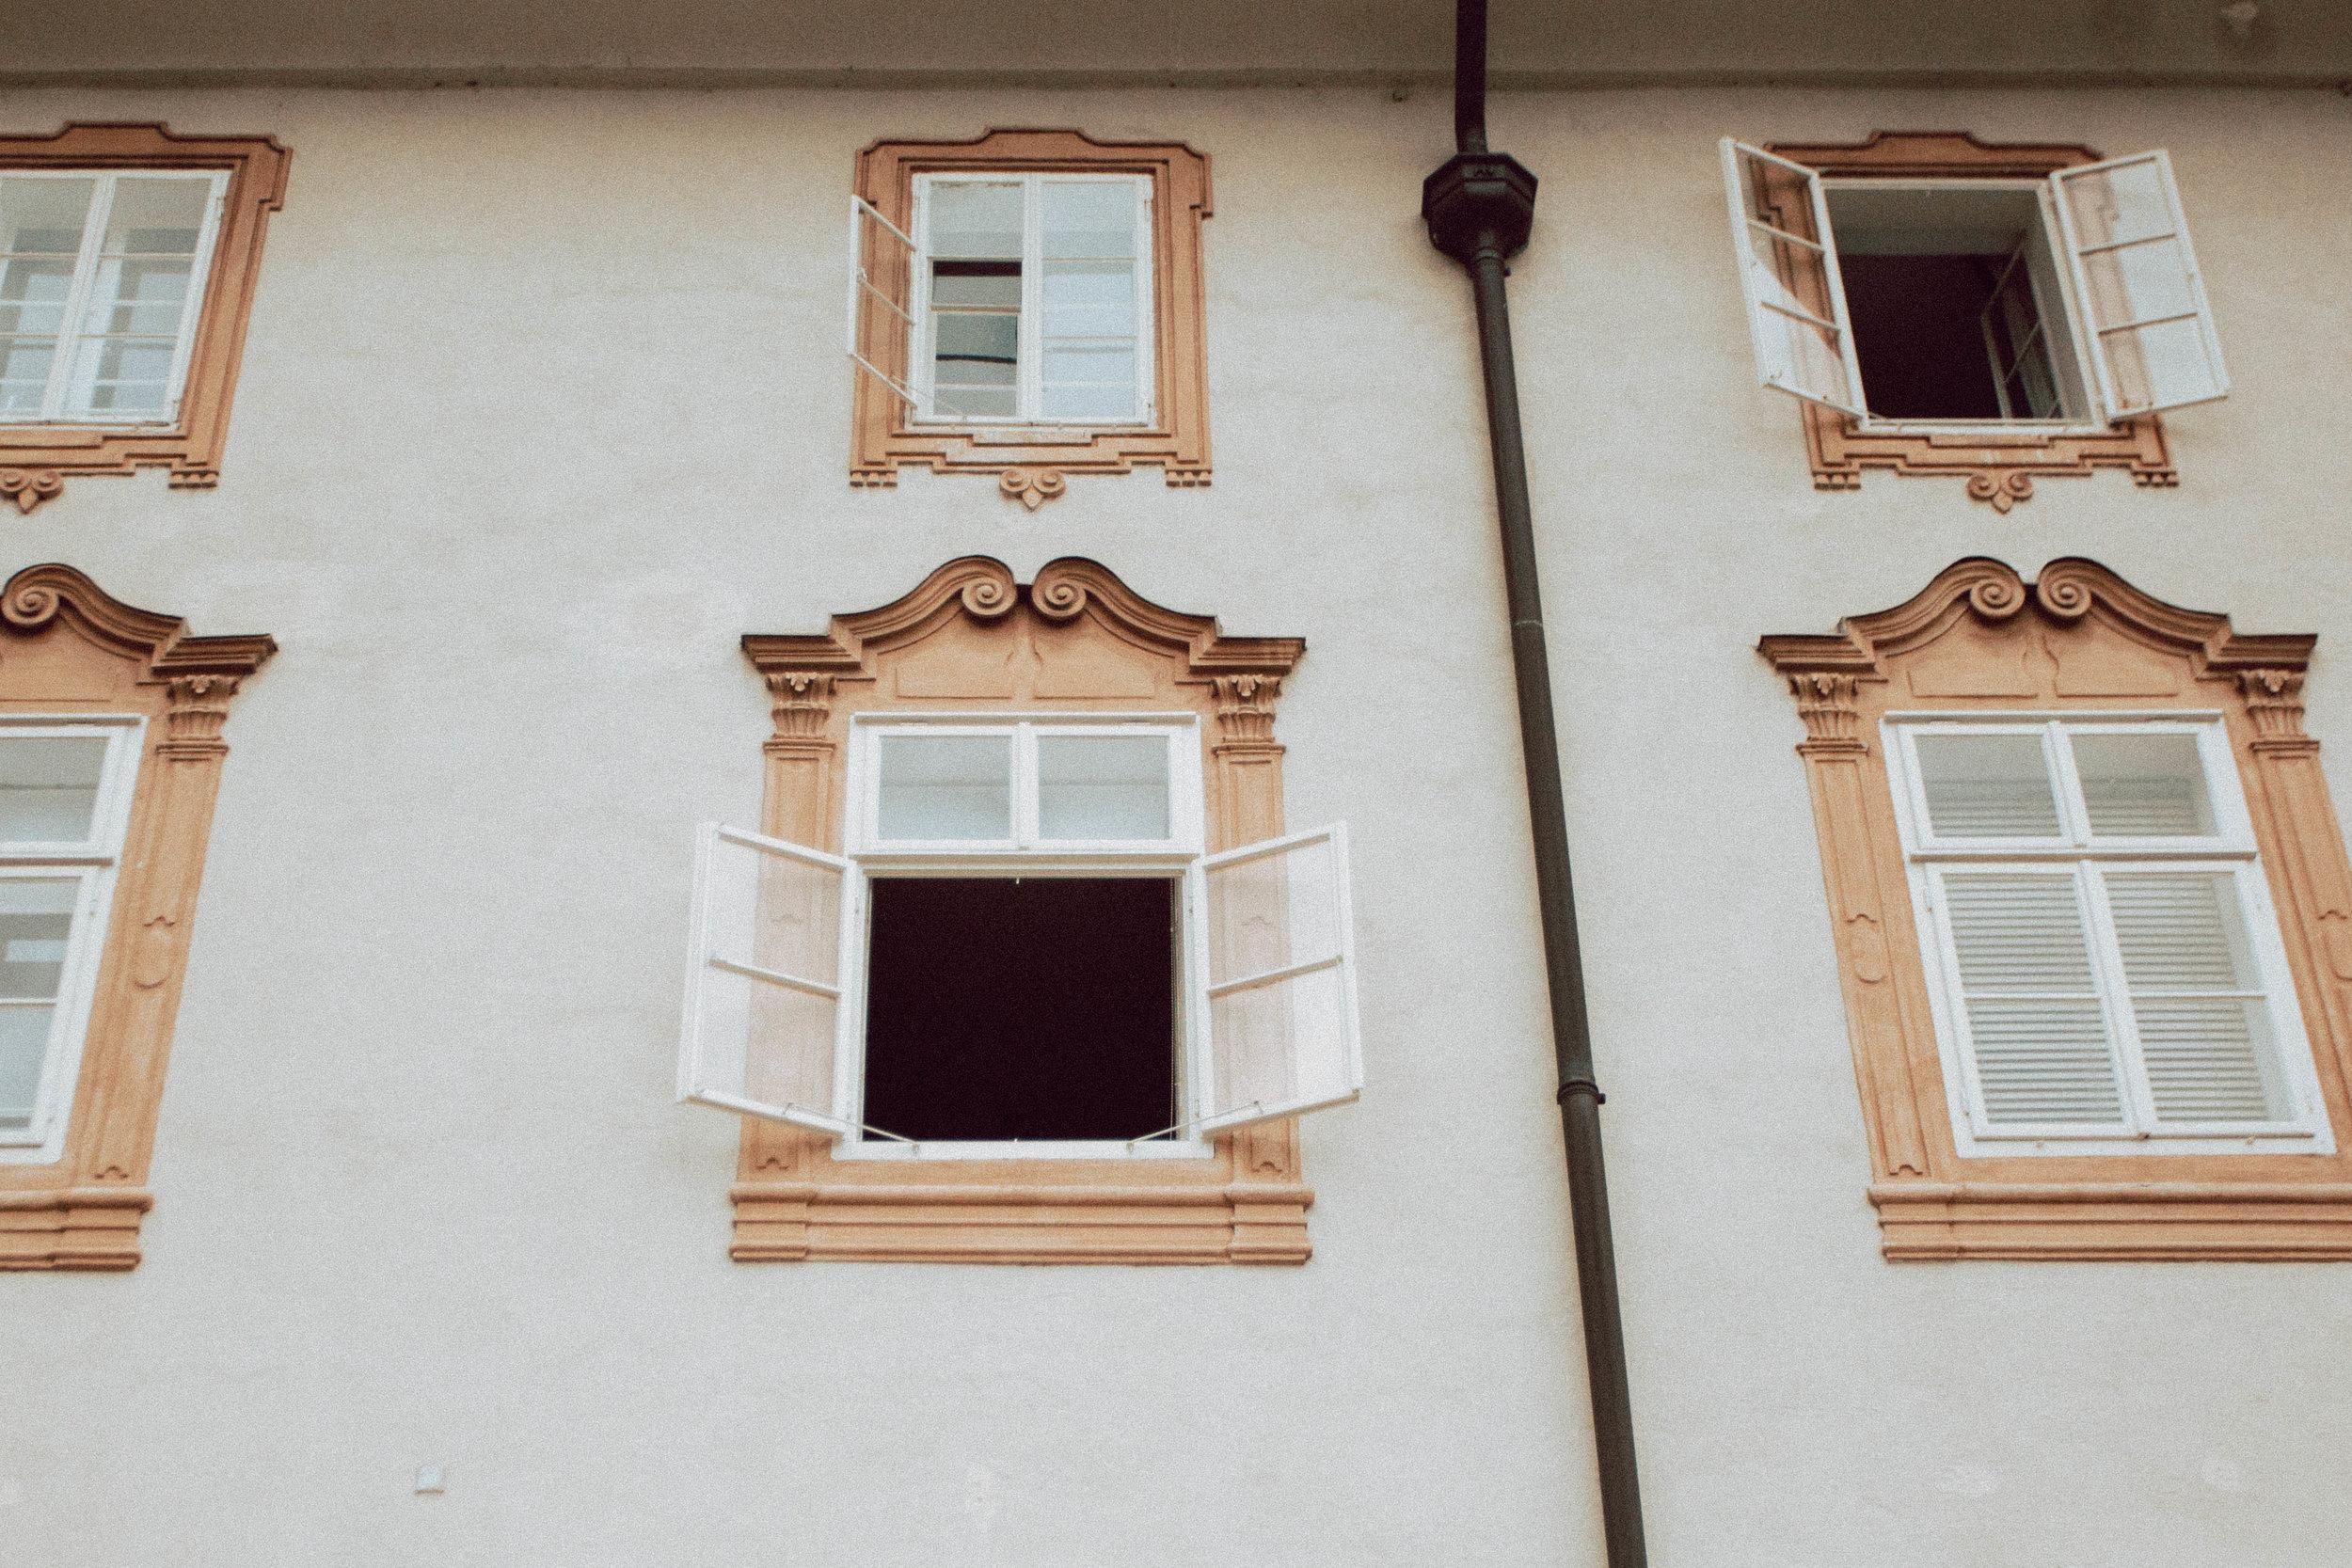 salzburg_june18-26.jpg